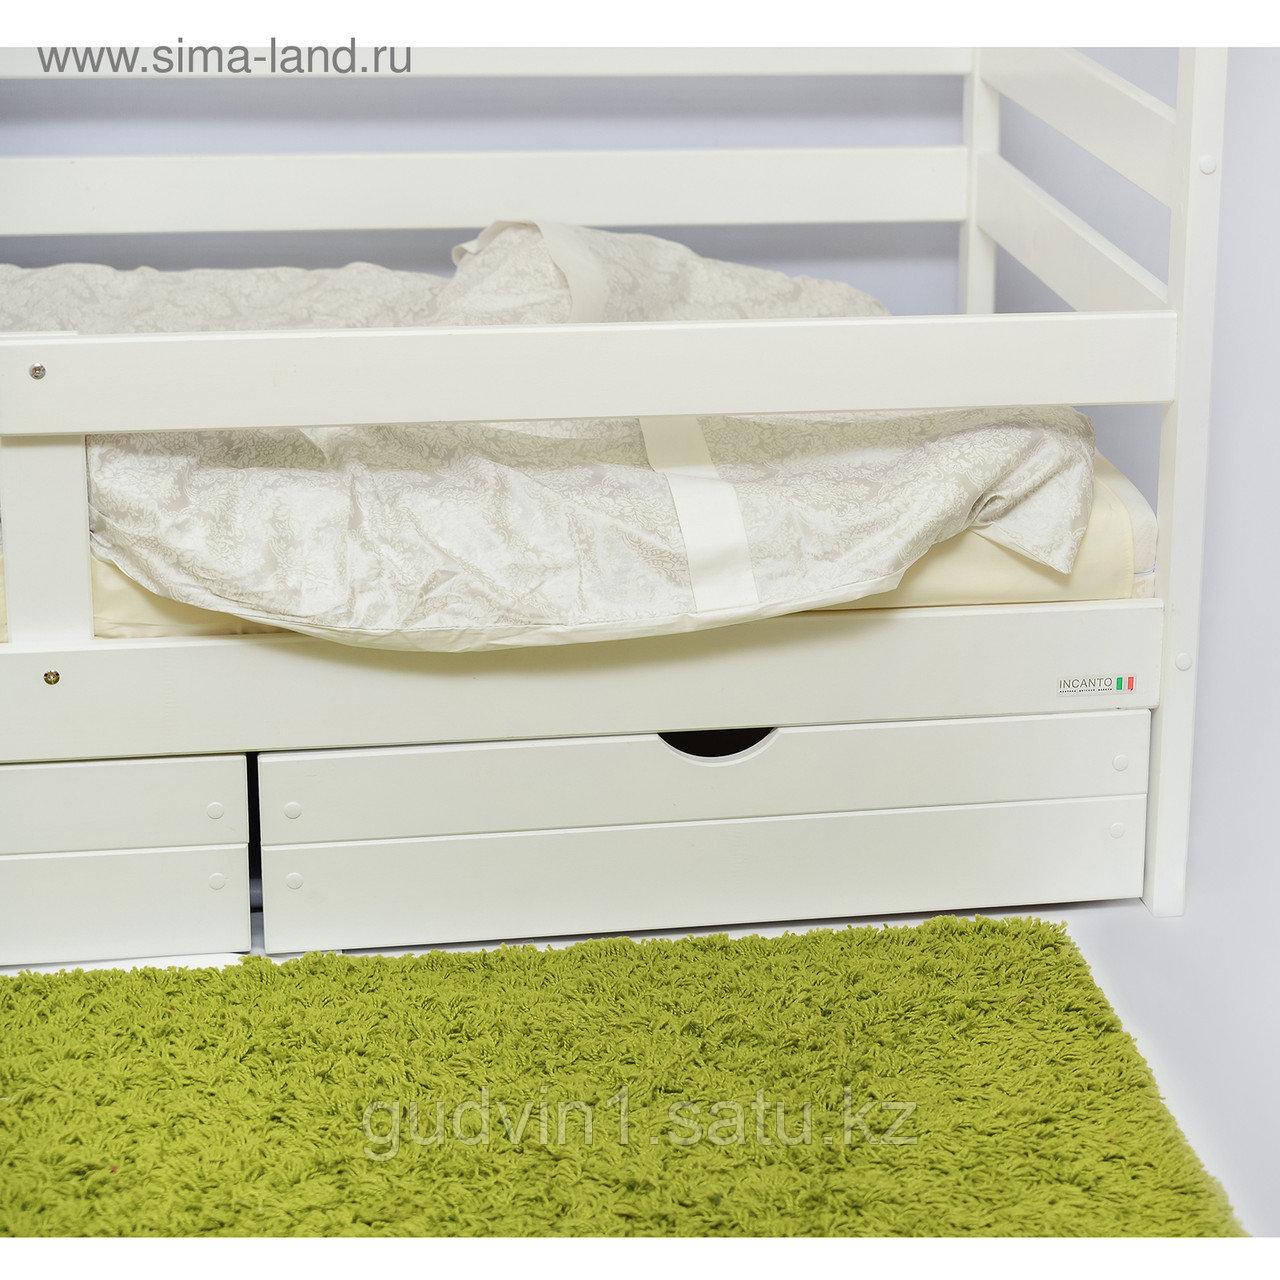 Incanto Комплект из 2-х ящиков для кровати DreamHome 00-92982